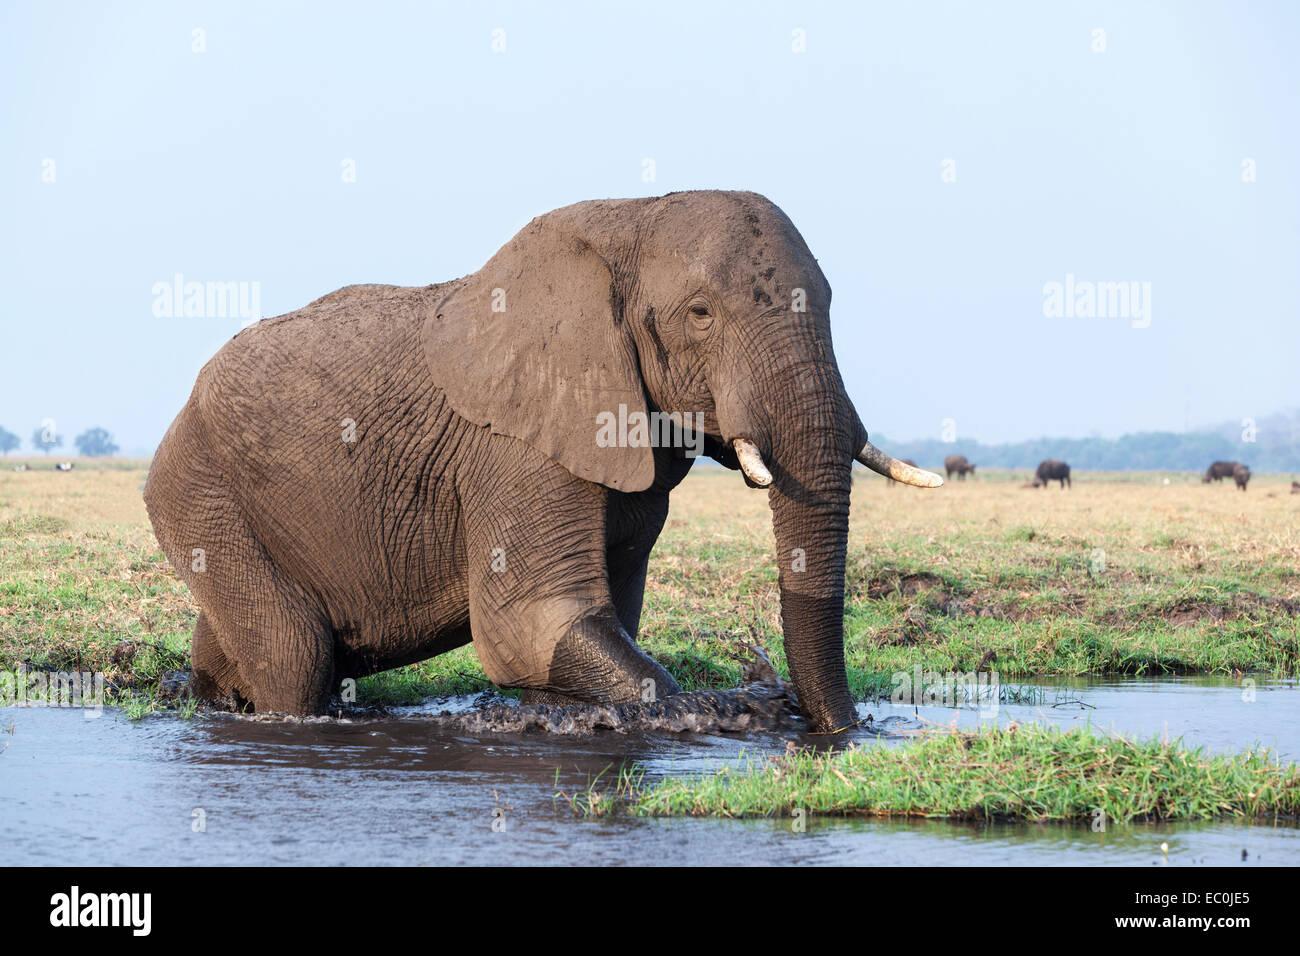 African elephant (Loxodonta africana) in water, Chobe National Park, Botswana, - Stock Image